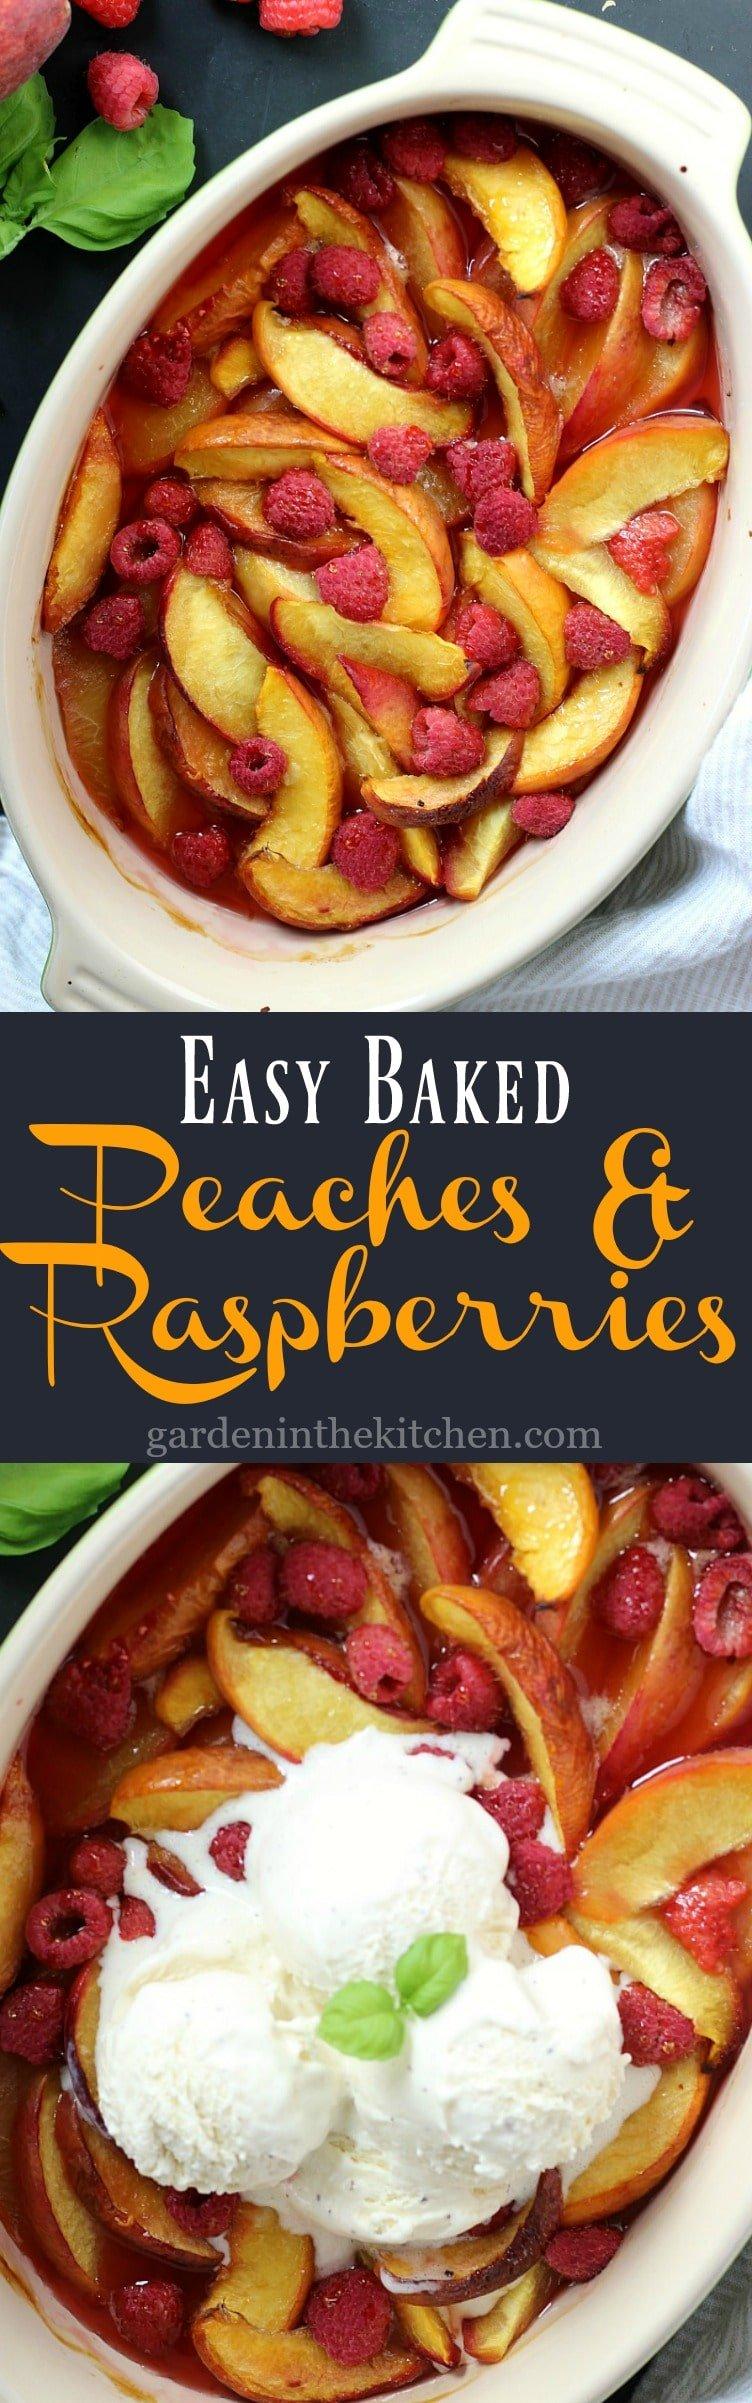 Easy Baked Peaches & Raspberries